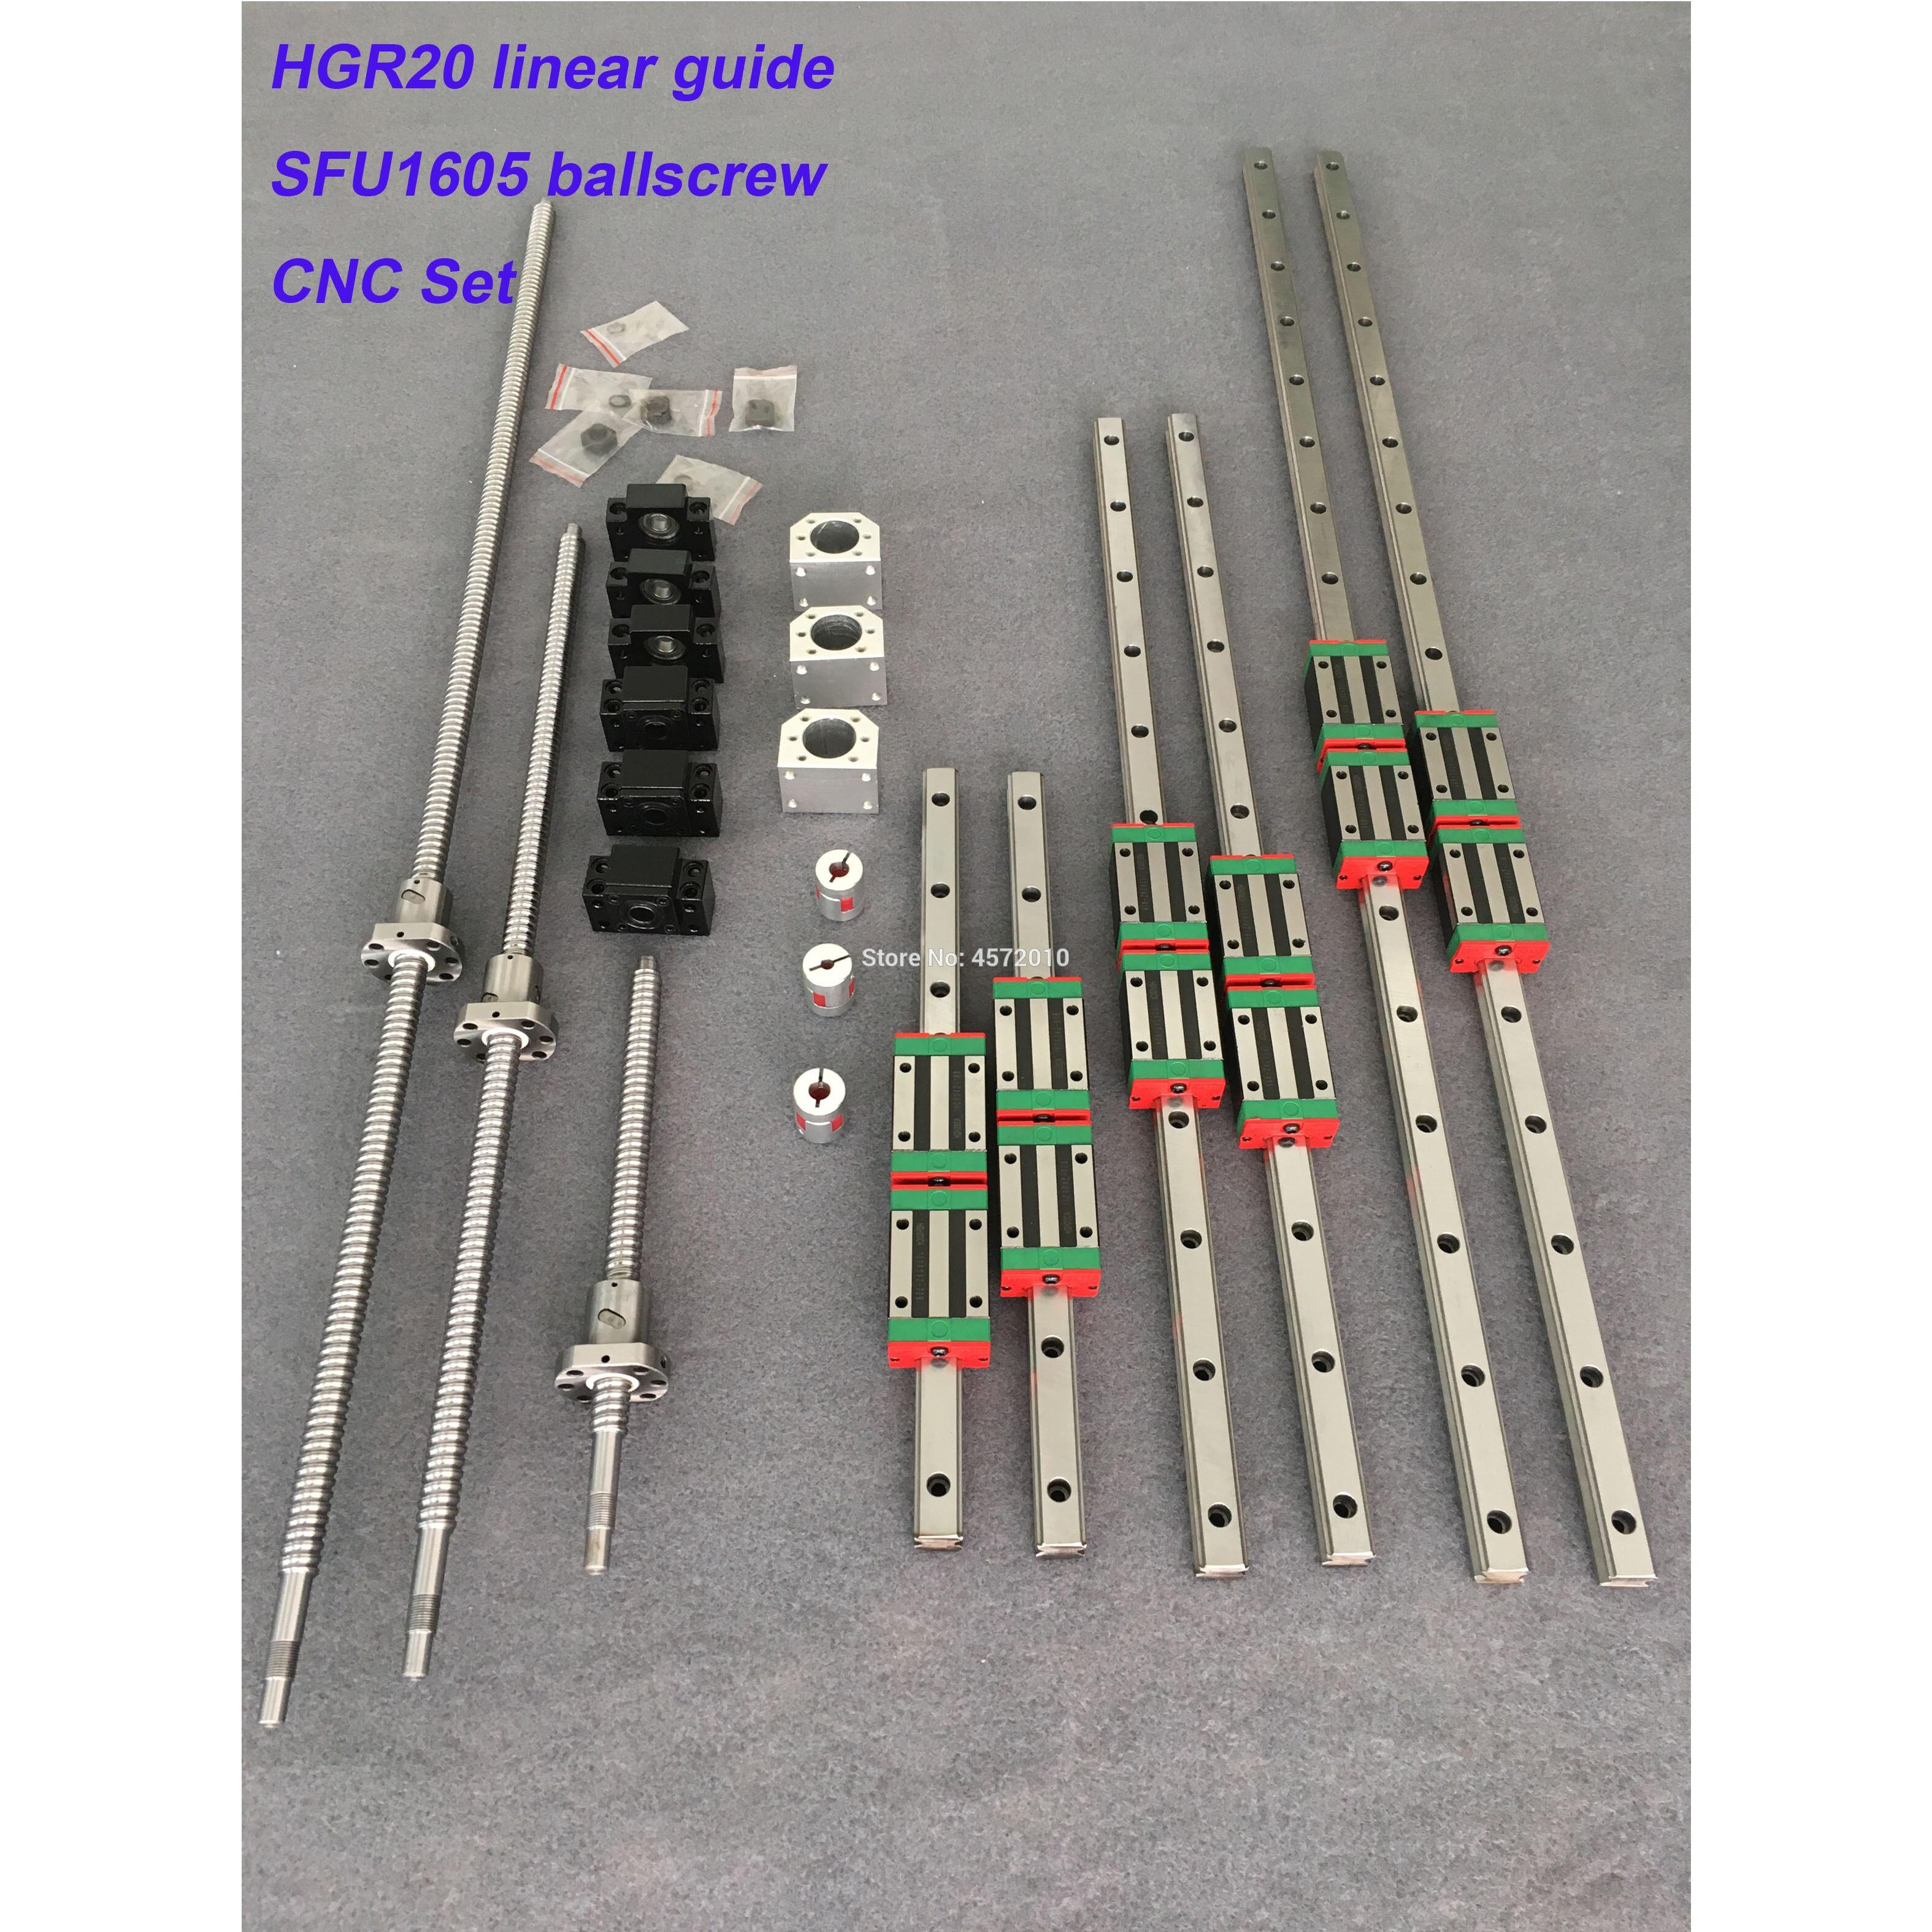 HGR20 - 400/1600 мм + HGH20CA + SFU1605 -400 мм + DFU2005 - 1600 мм + Поддержка + Корпус гайки + муфта